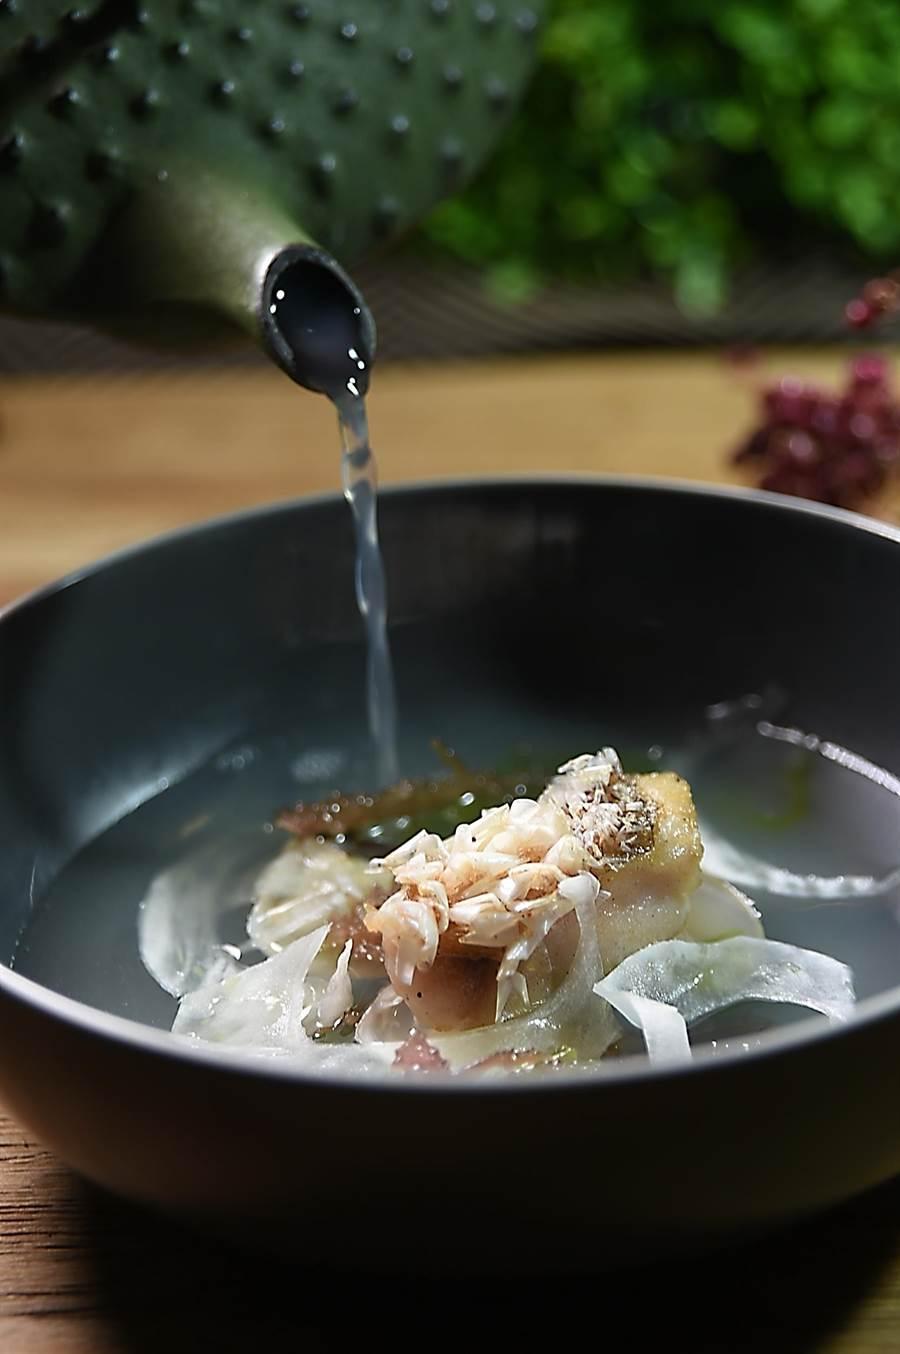 〈 TK SEAFOOD & STEAK〉菜單上的〈立鱗馬頭魚.澎湖海菜〉,享用時可以搭配蛤蜊雞湯增加鮮甜度。(圖/姚舜)